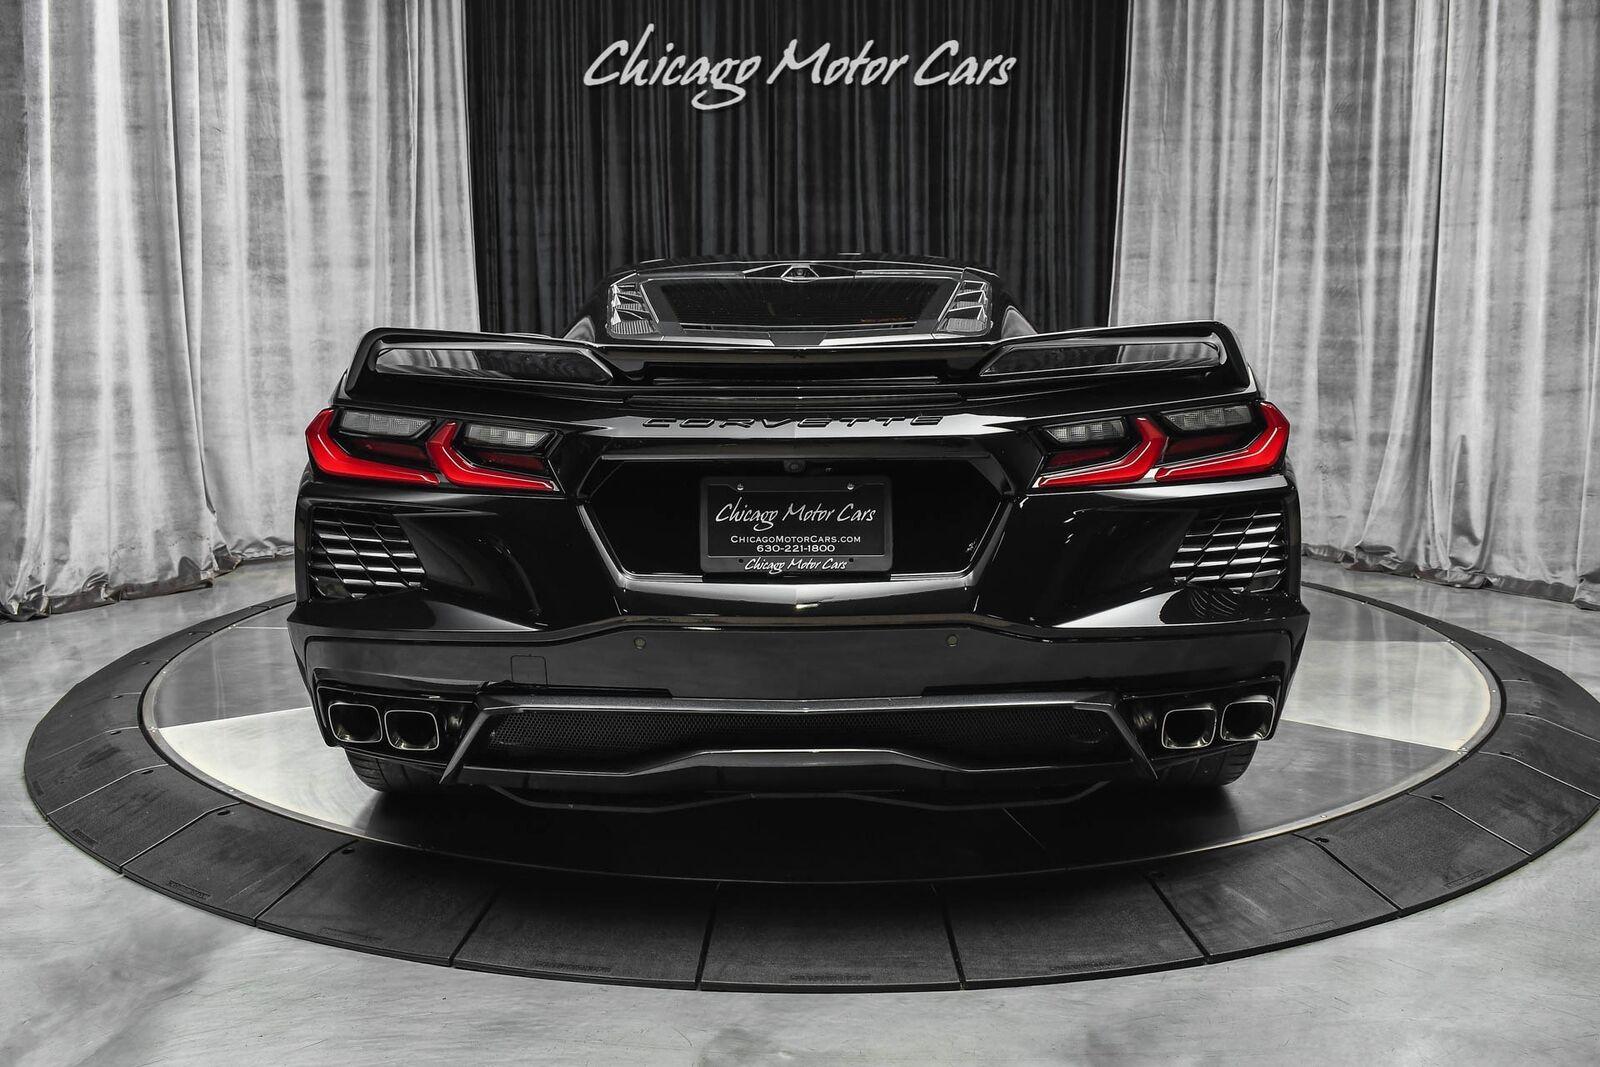 2020 Black Chevrolet Corvette Stingray 3LT   C7 Corvette Photo 4